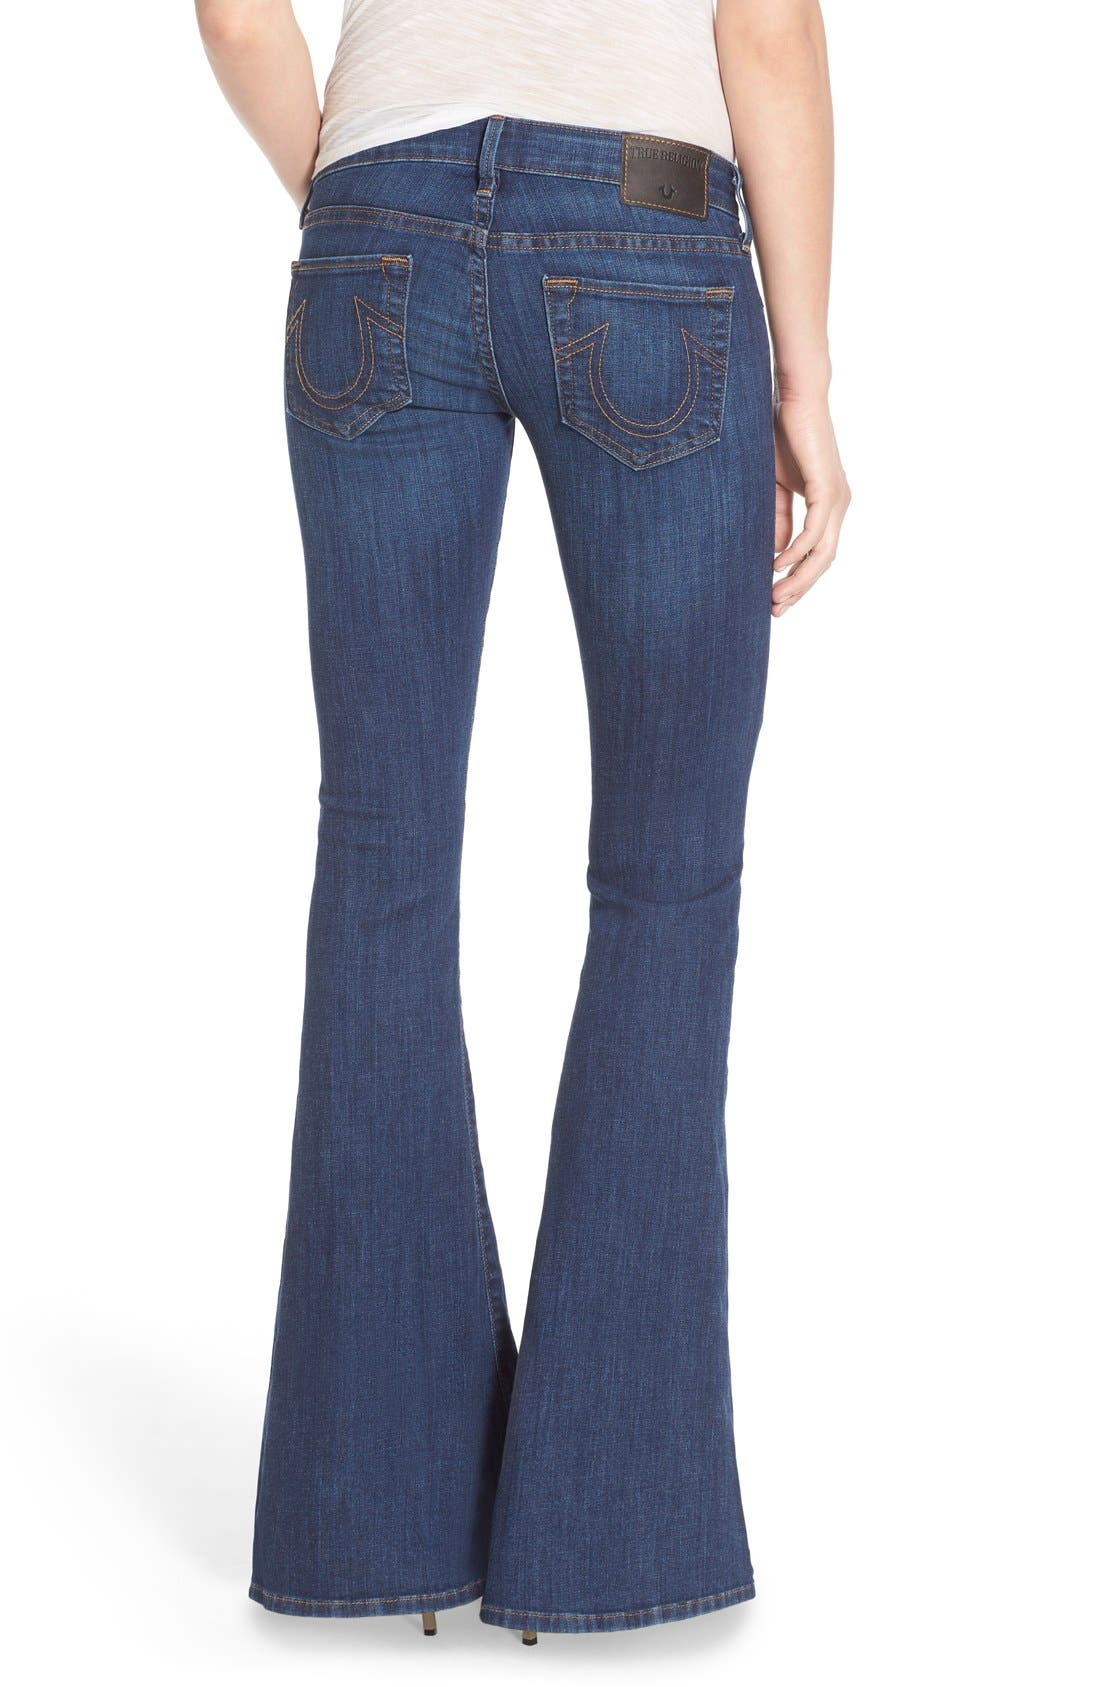 Alternate Image 2  - True Religion Brand Jeans 'Karlie' Bell Bottom Jeans (Worn Vintage)